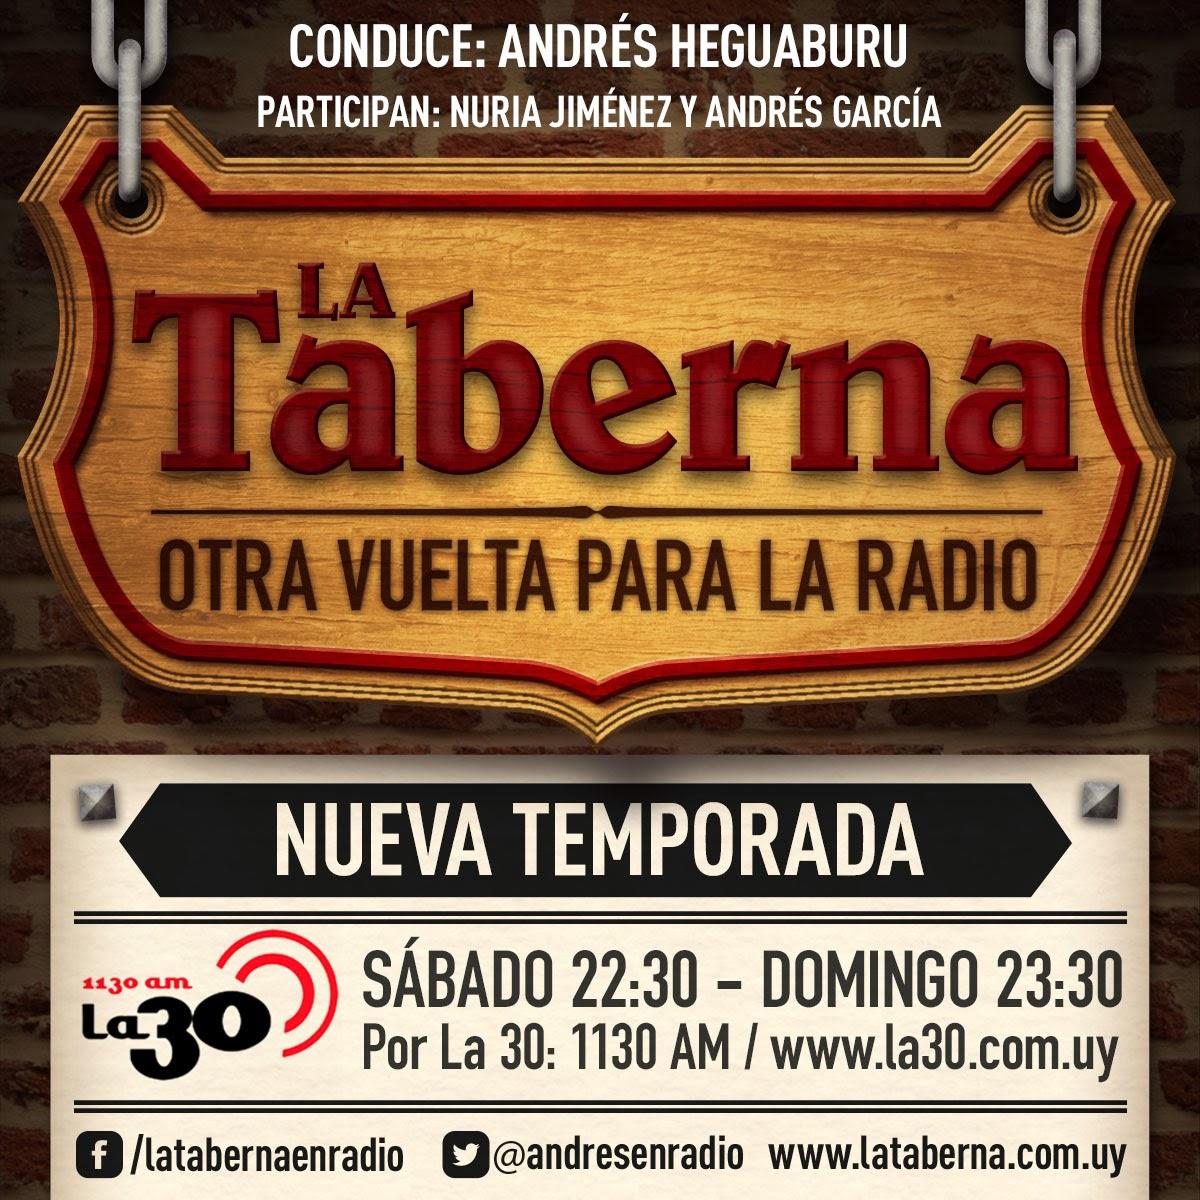 La Taberna - Otra vuelta para la Radio